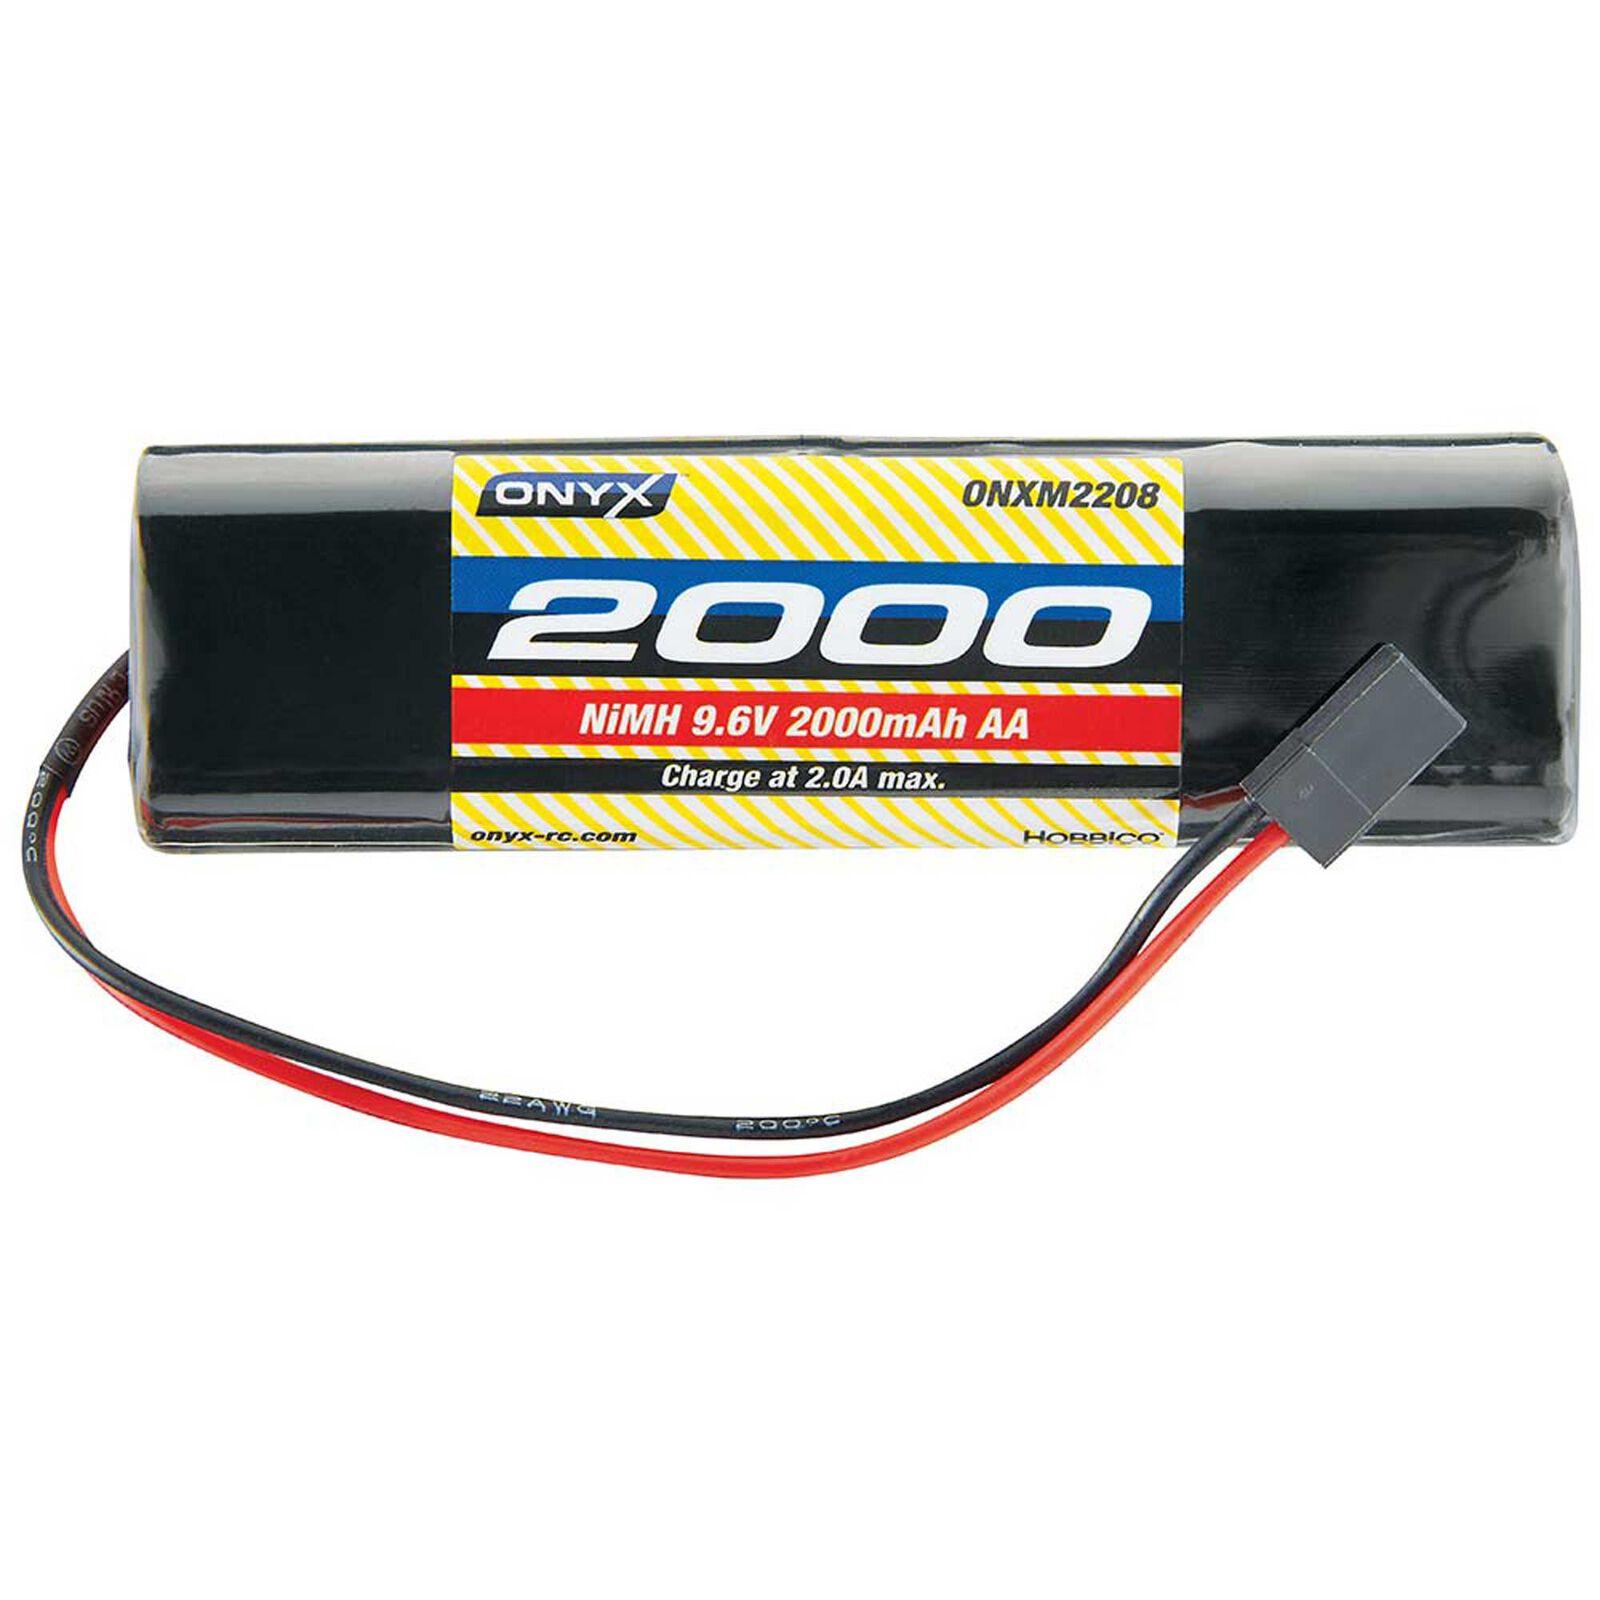 9.6V 2000mAh AA NiMH Square Transmitter Battery: Universal Receiver